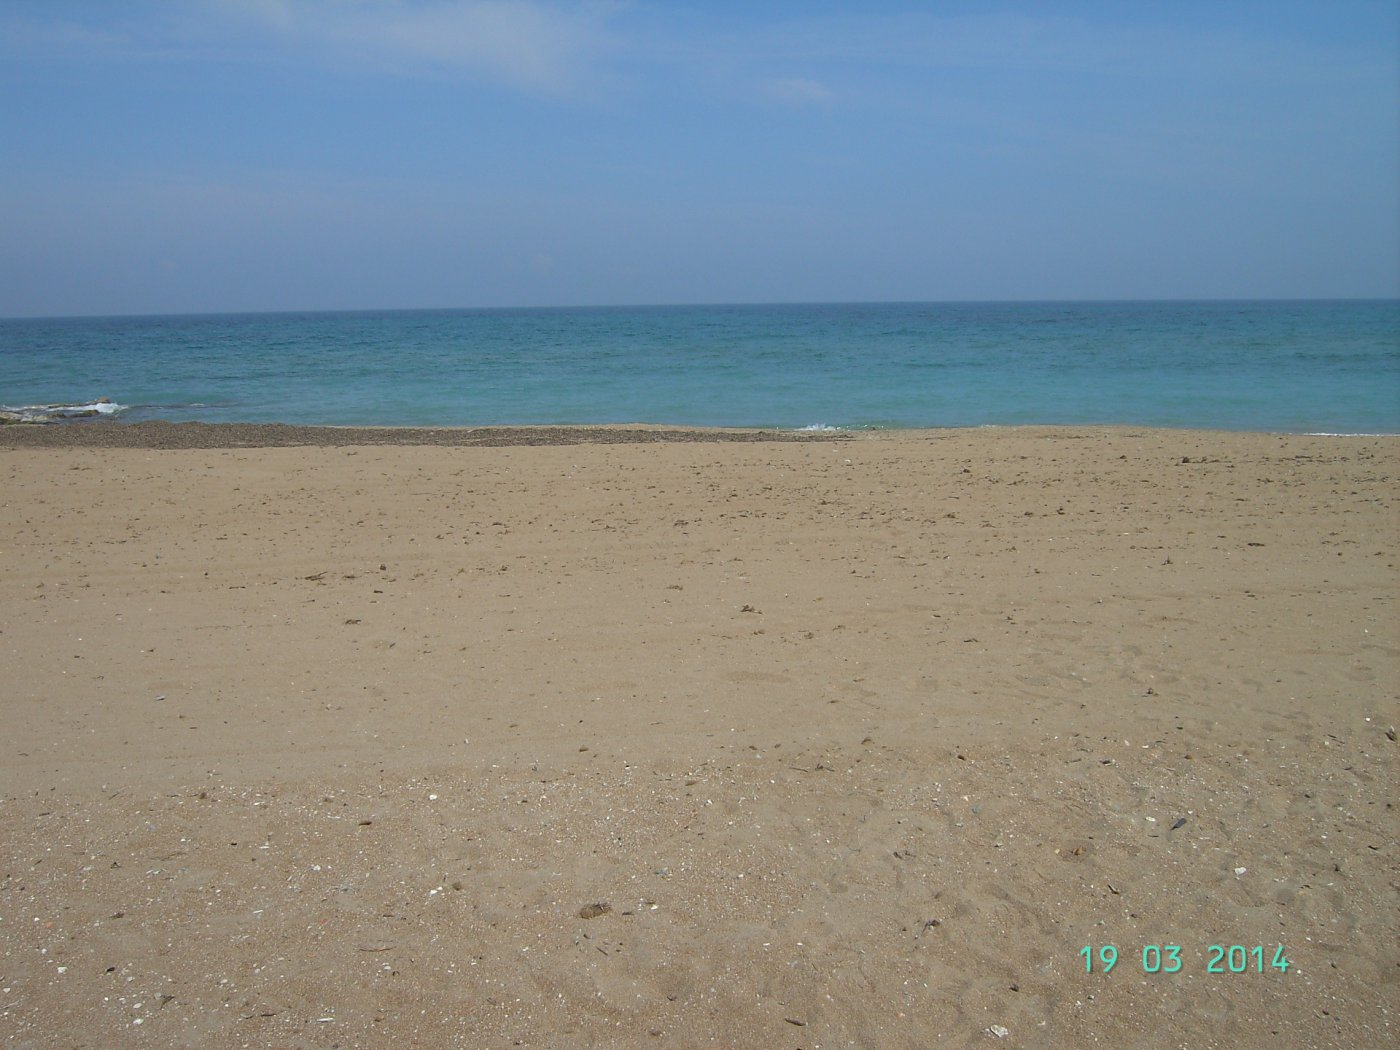 Adosado - Entrar A Vivir - Las Marinas - Denia